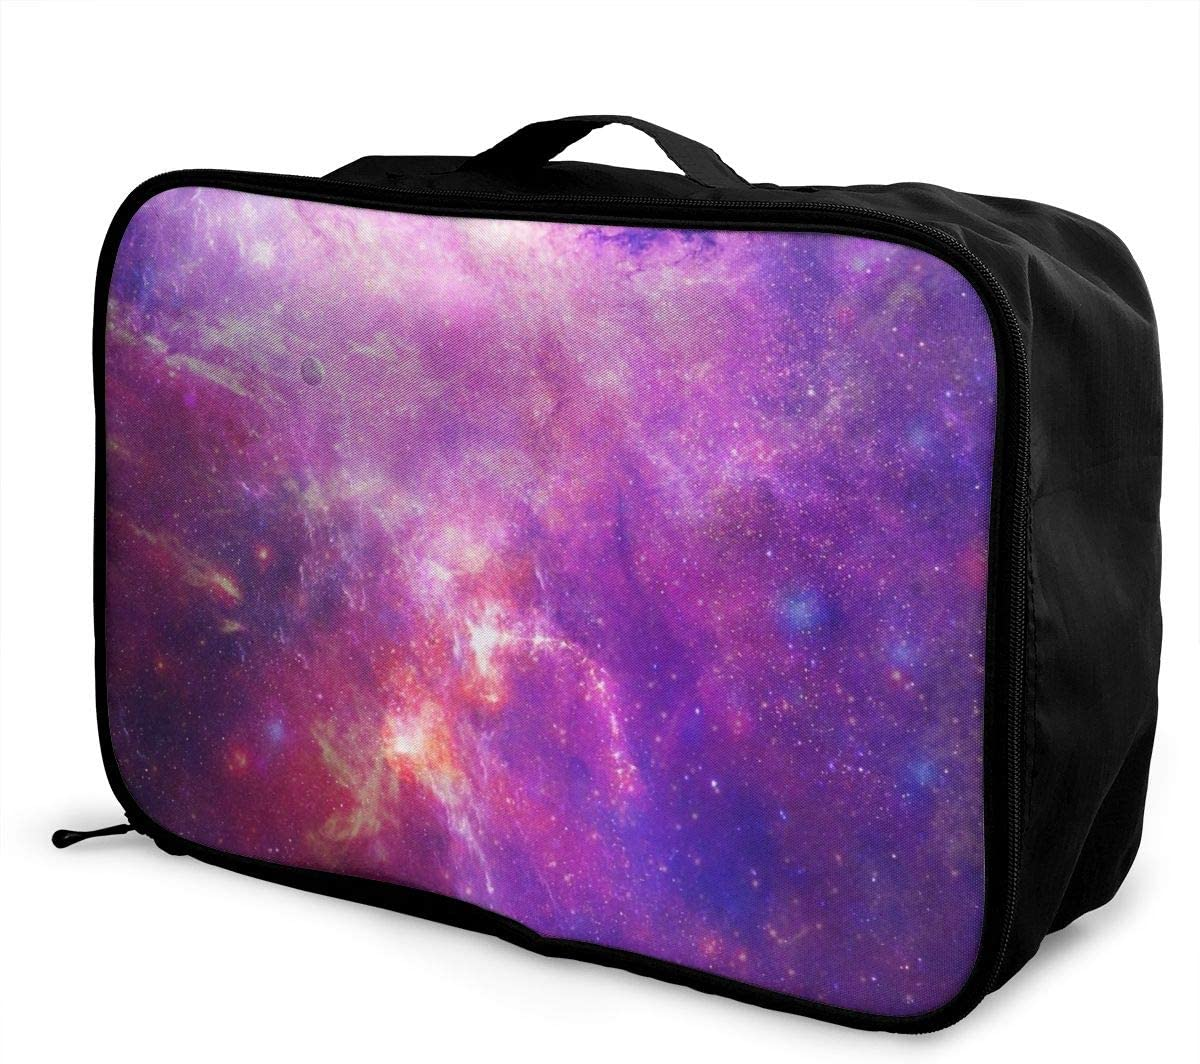 Yunshm Space Nebula Galaxy Stars Bright Saturated Personalized Trolley Handbag Waterproof Unisex Large Capacity For Business Travel Storage